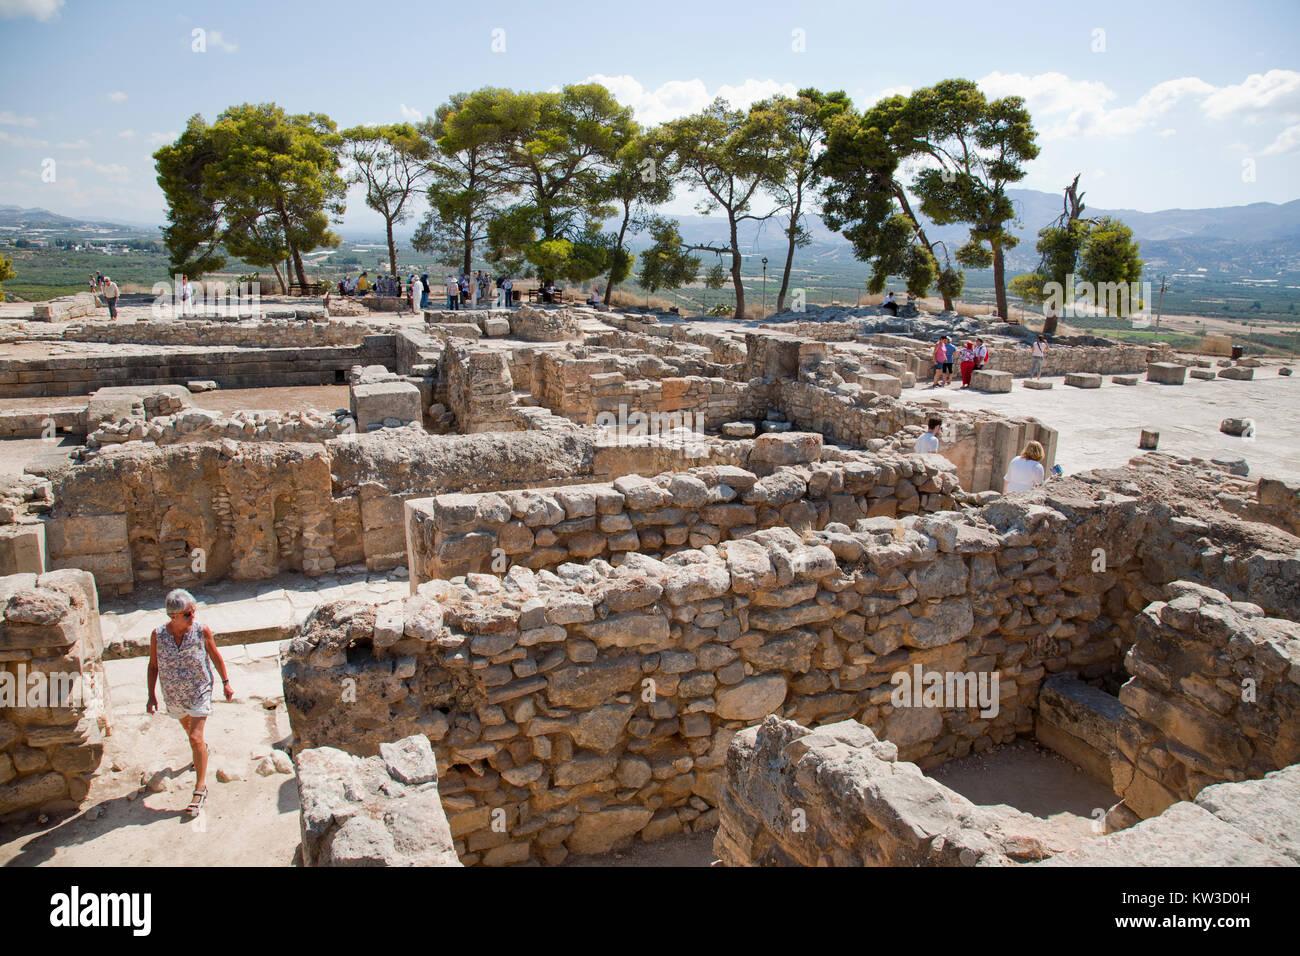 Central courtyard area, Festos, archeological area, Crete island, Greece, Europe Stock Photo